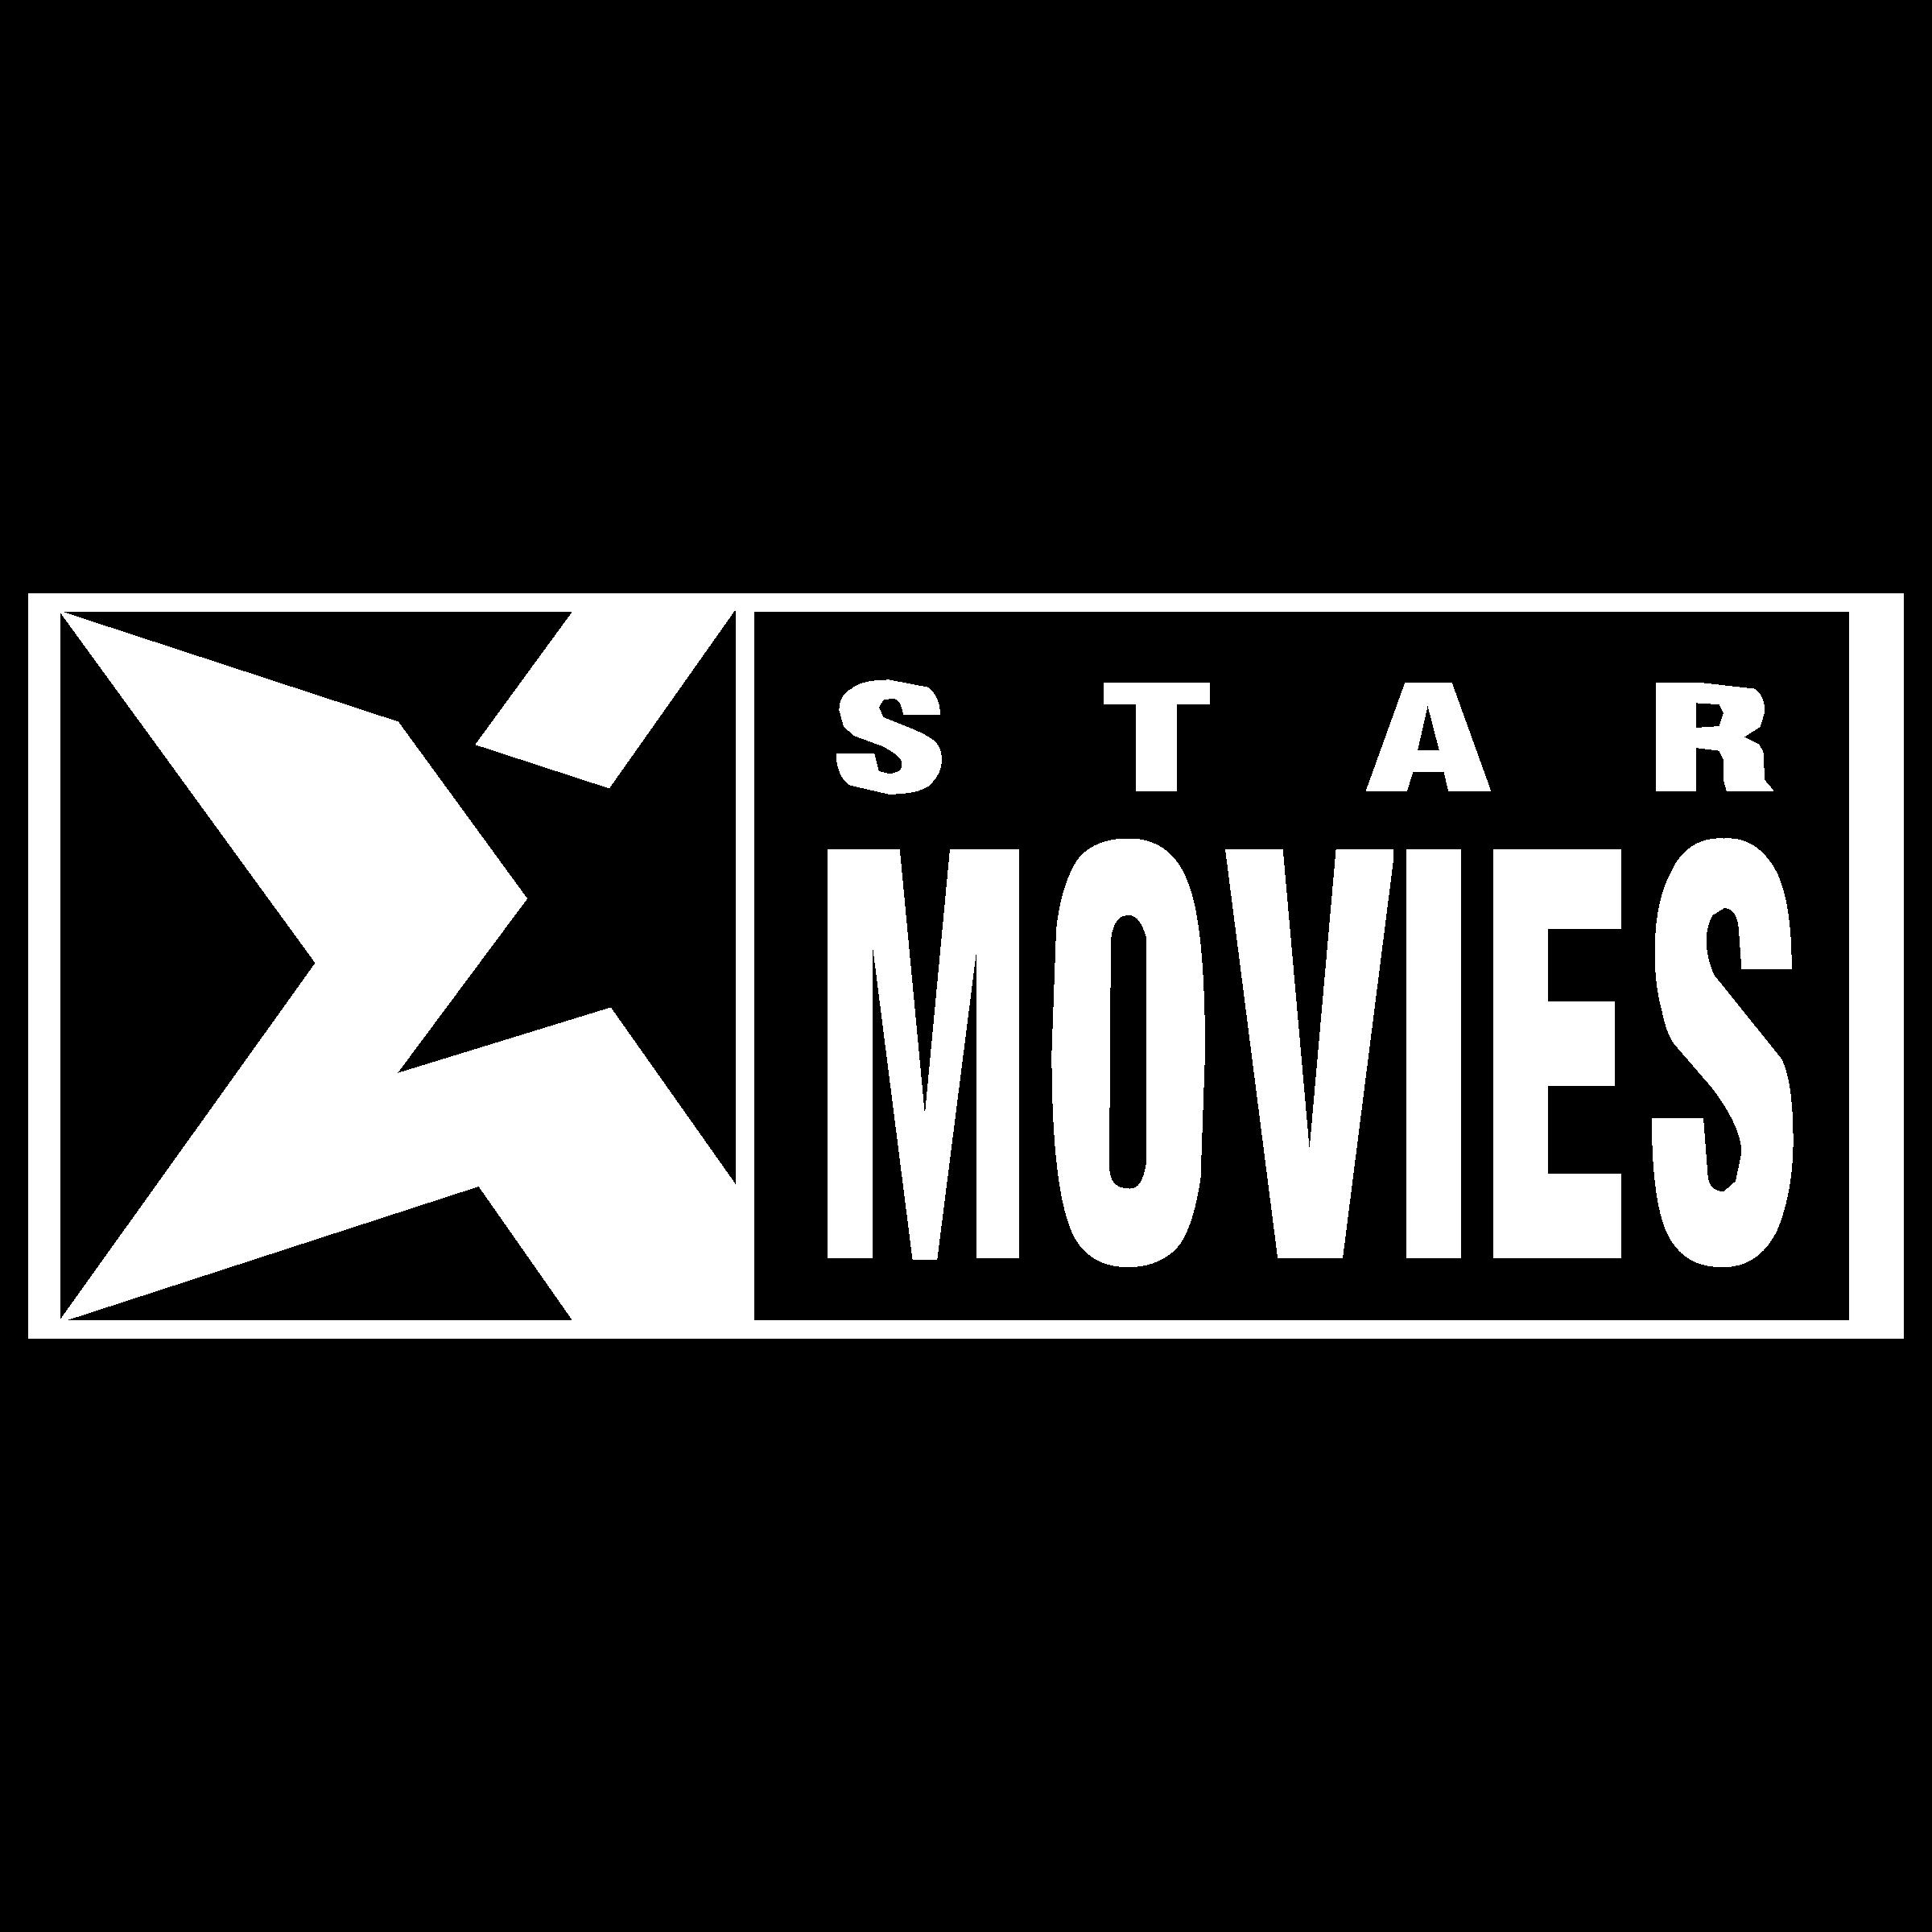 Star Movies Logo Png Transparent Svg Vector Freebie Supply